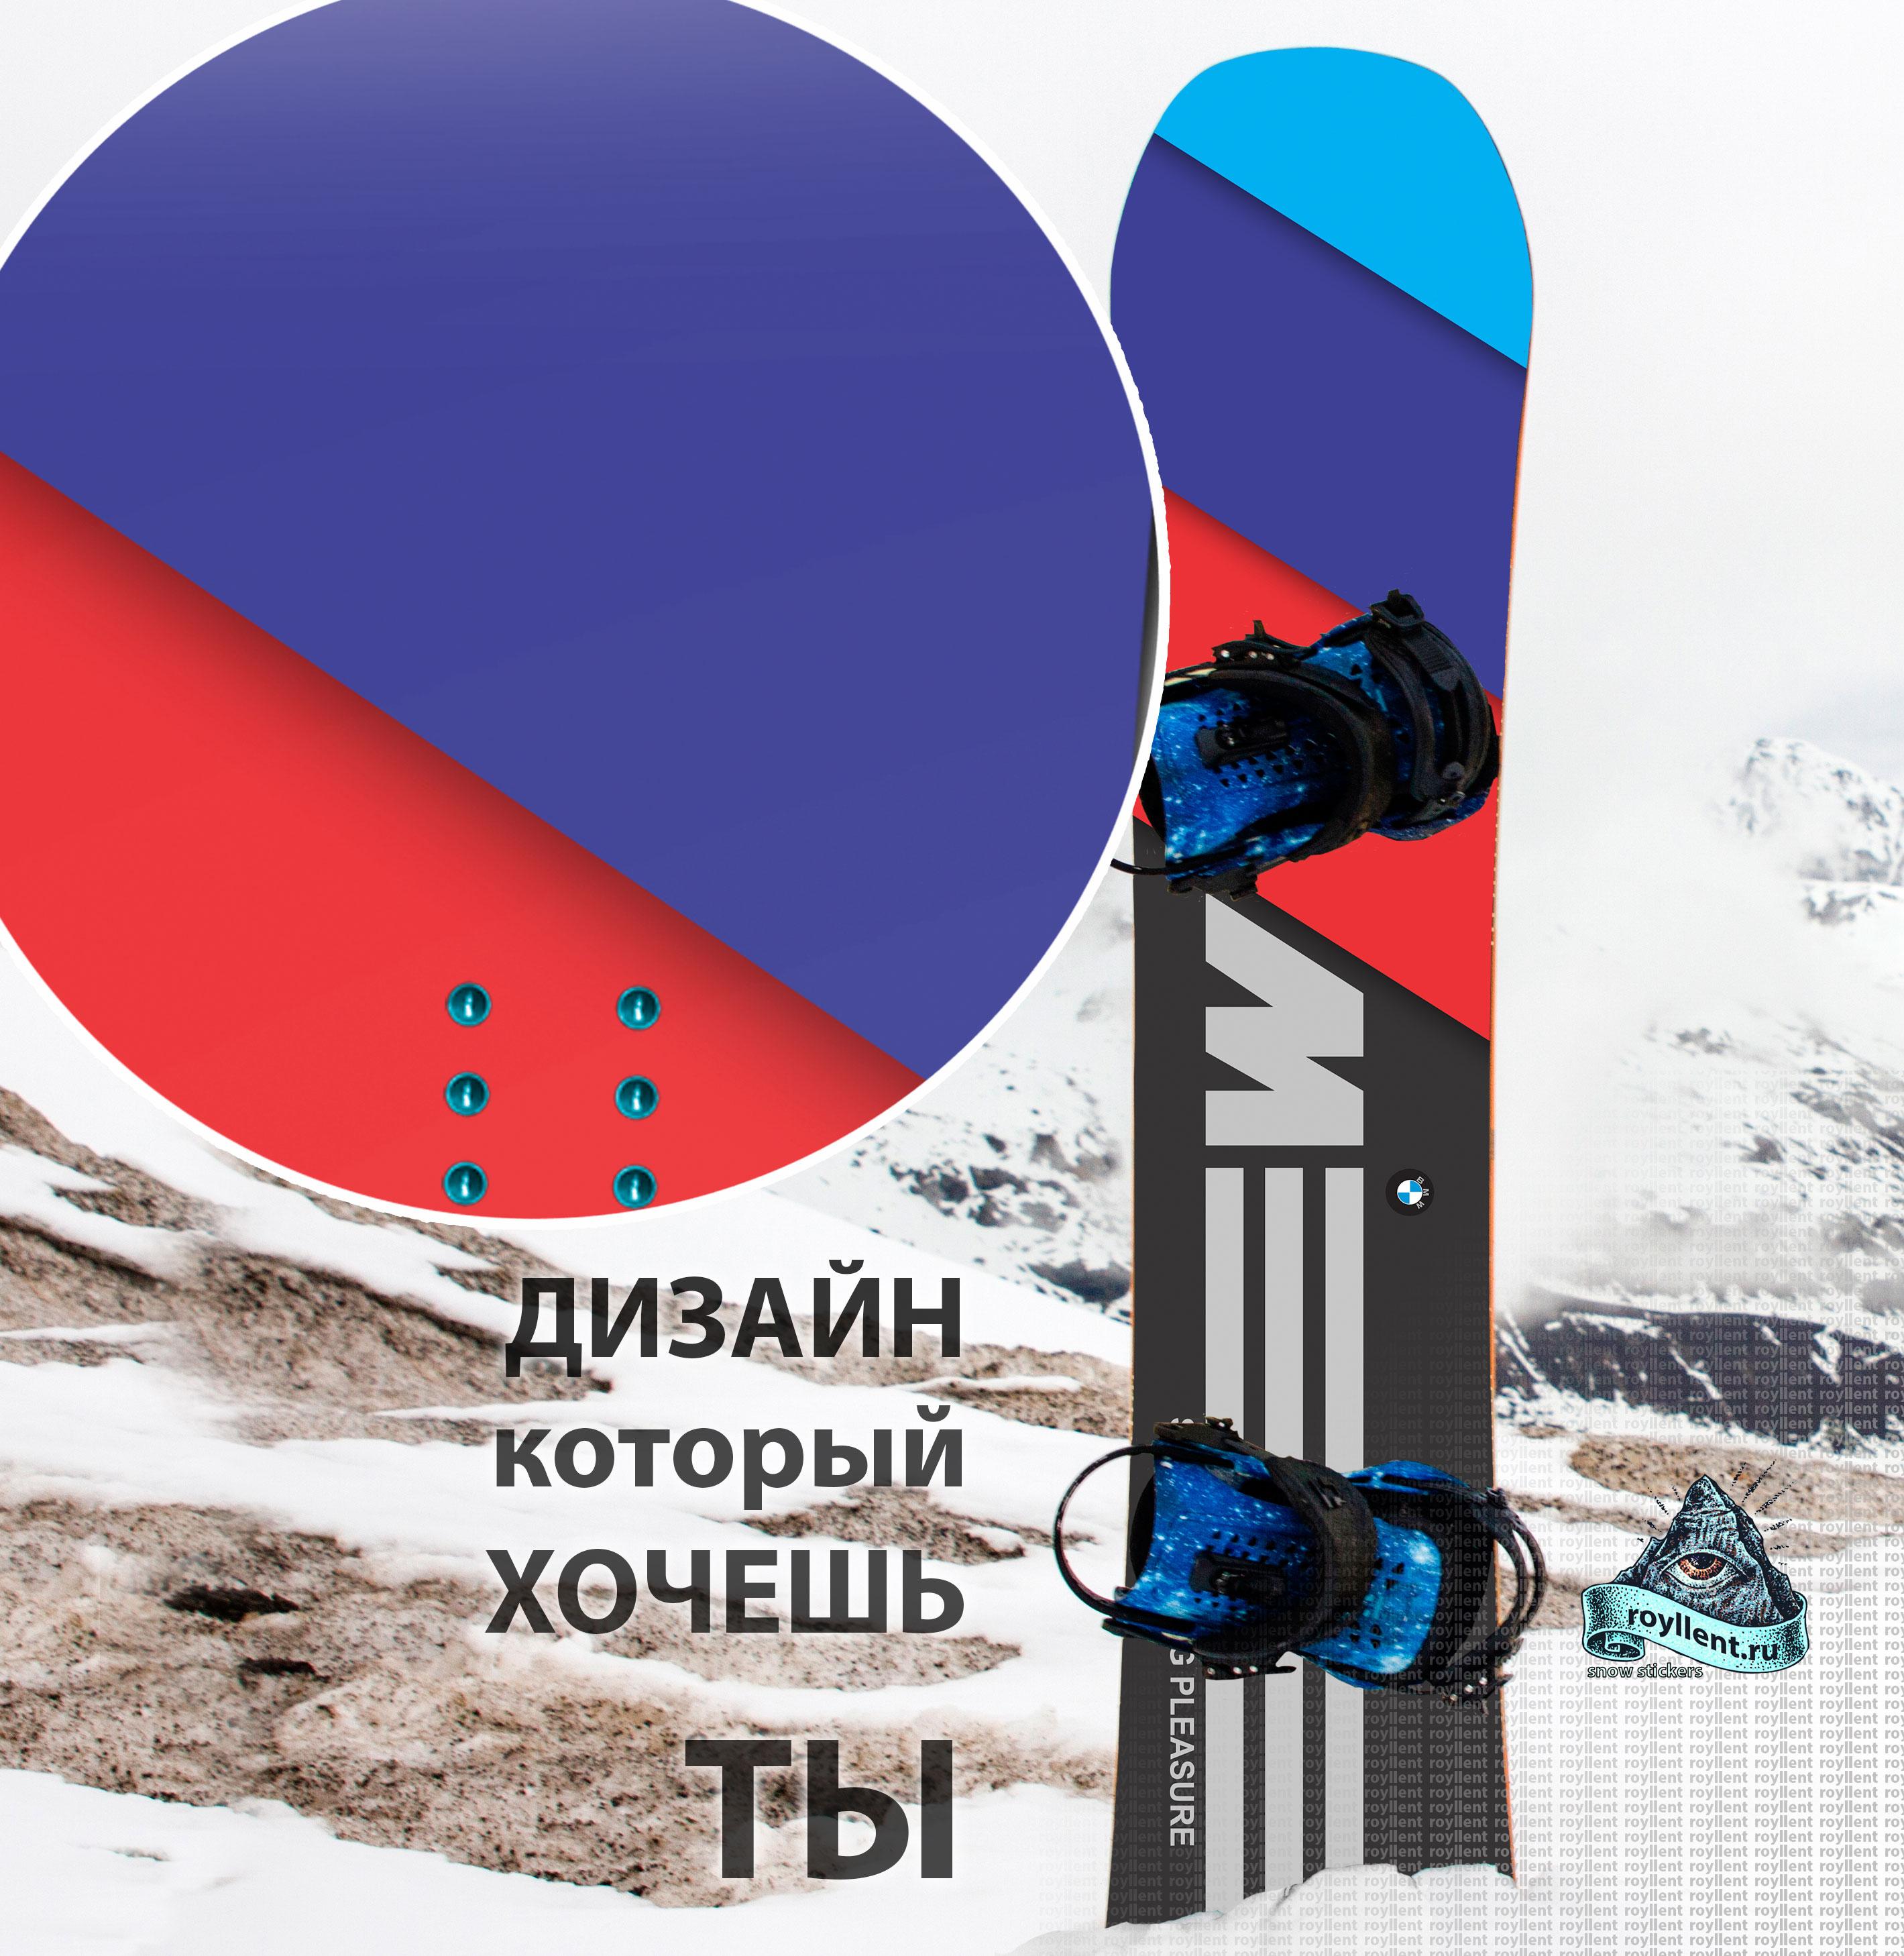 Хочу купить сноуборд наклейку виниловую БМВ М